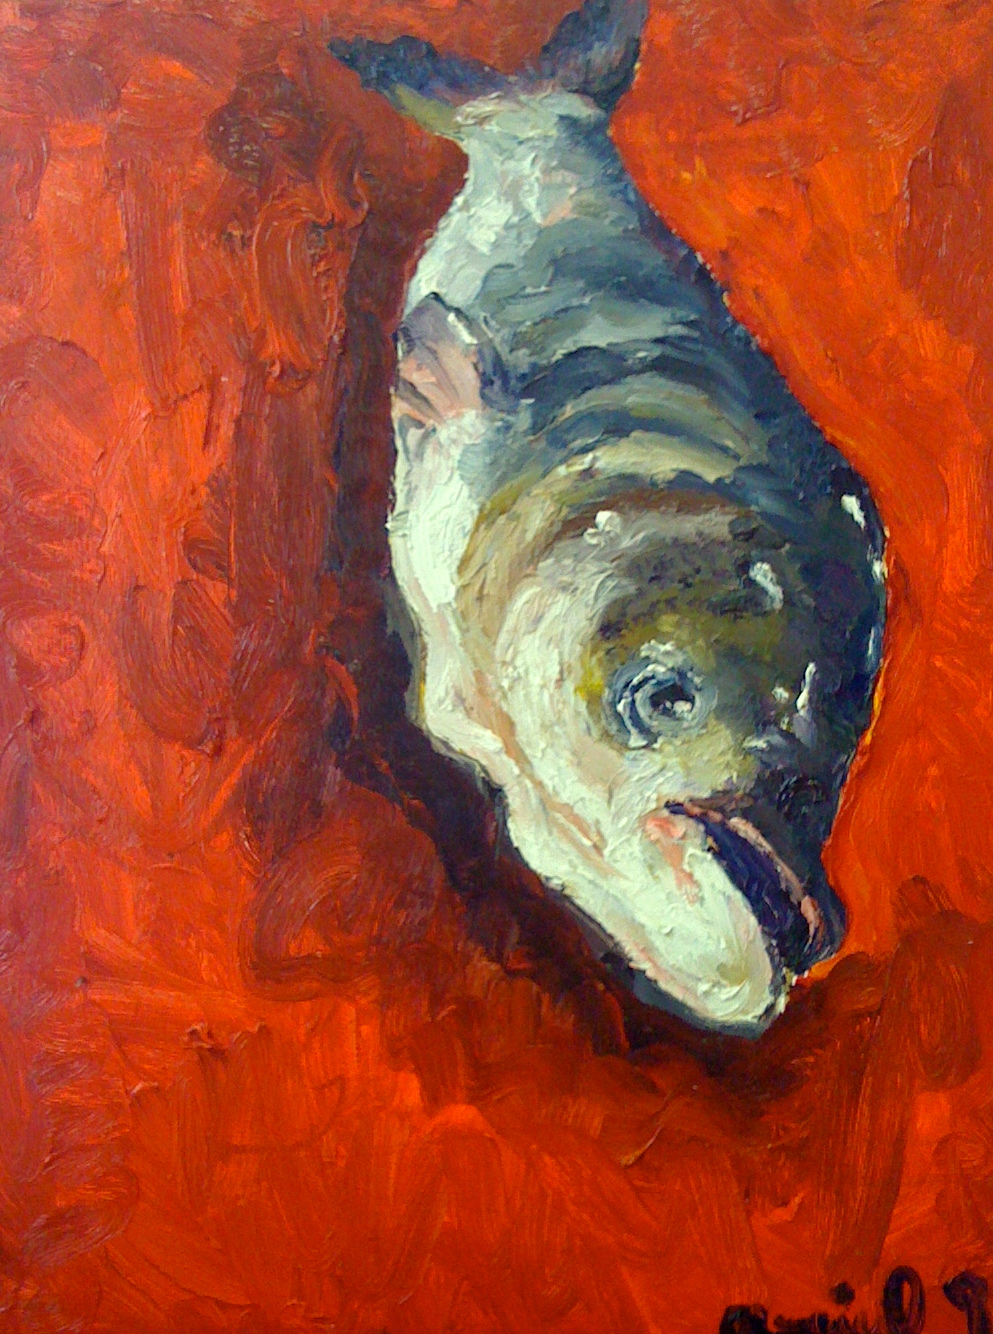 Ariel Navas - Fish (2009) Oil on canvas